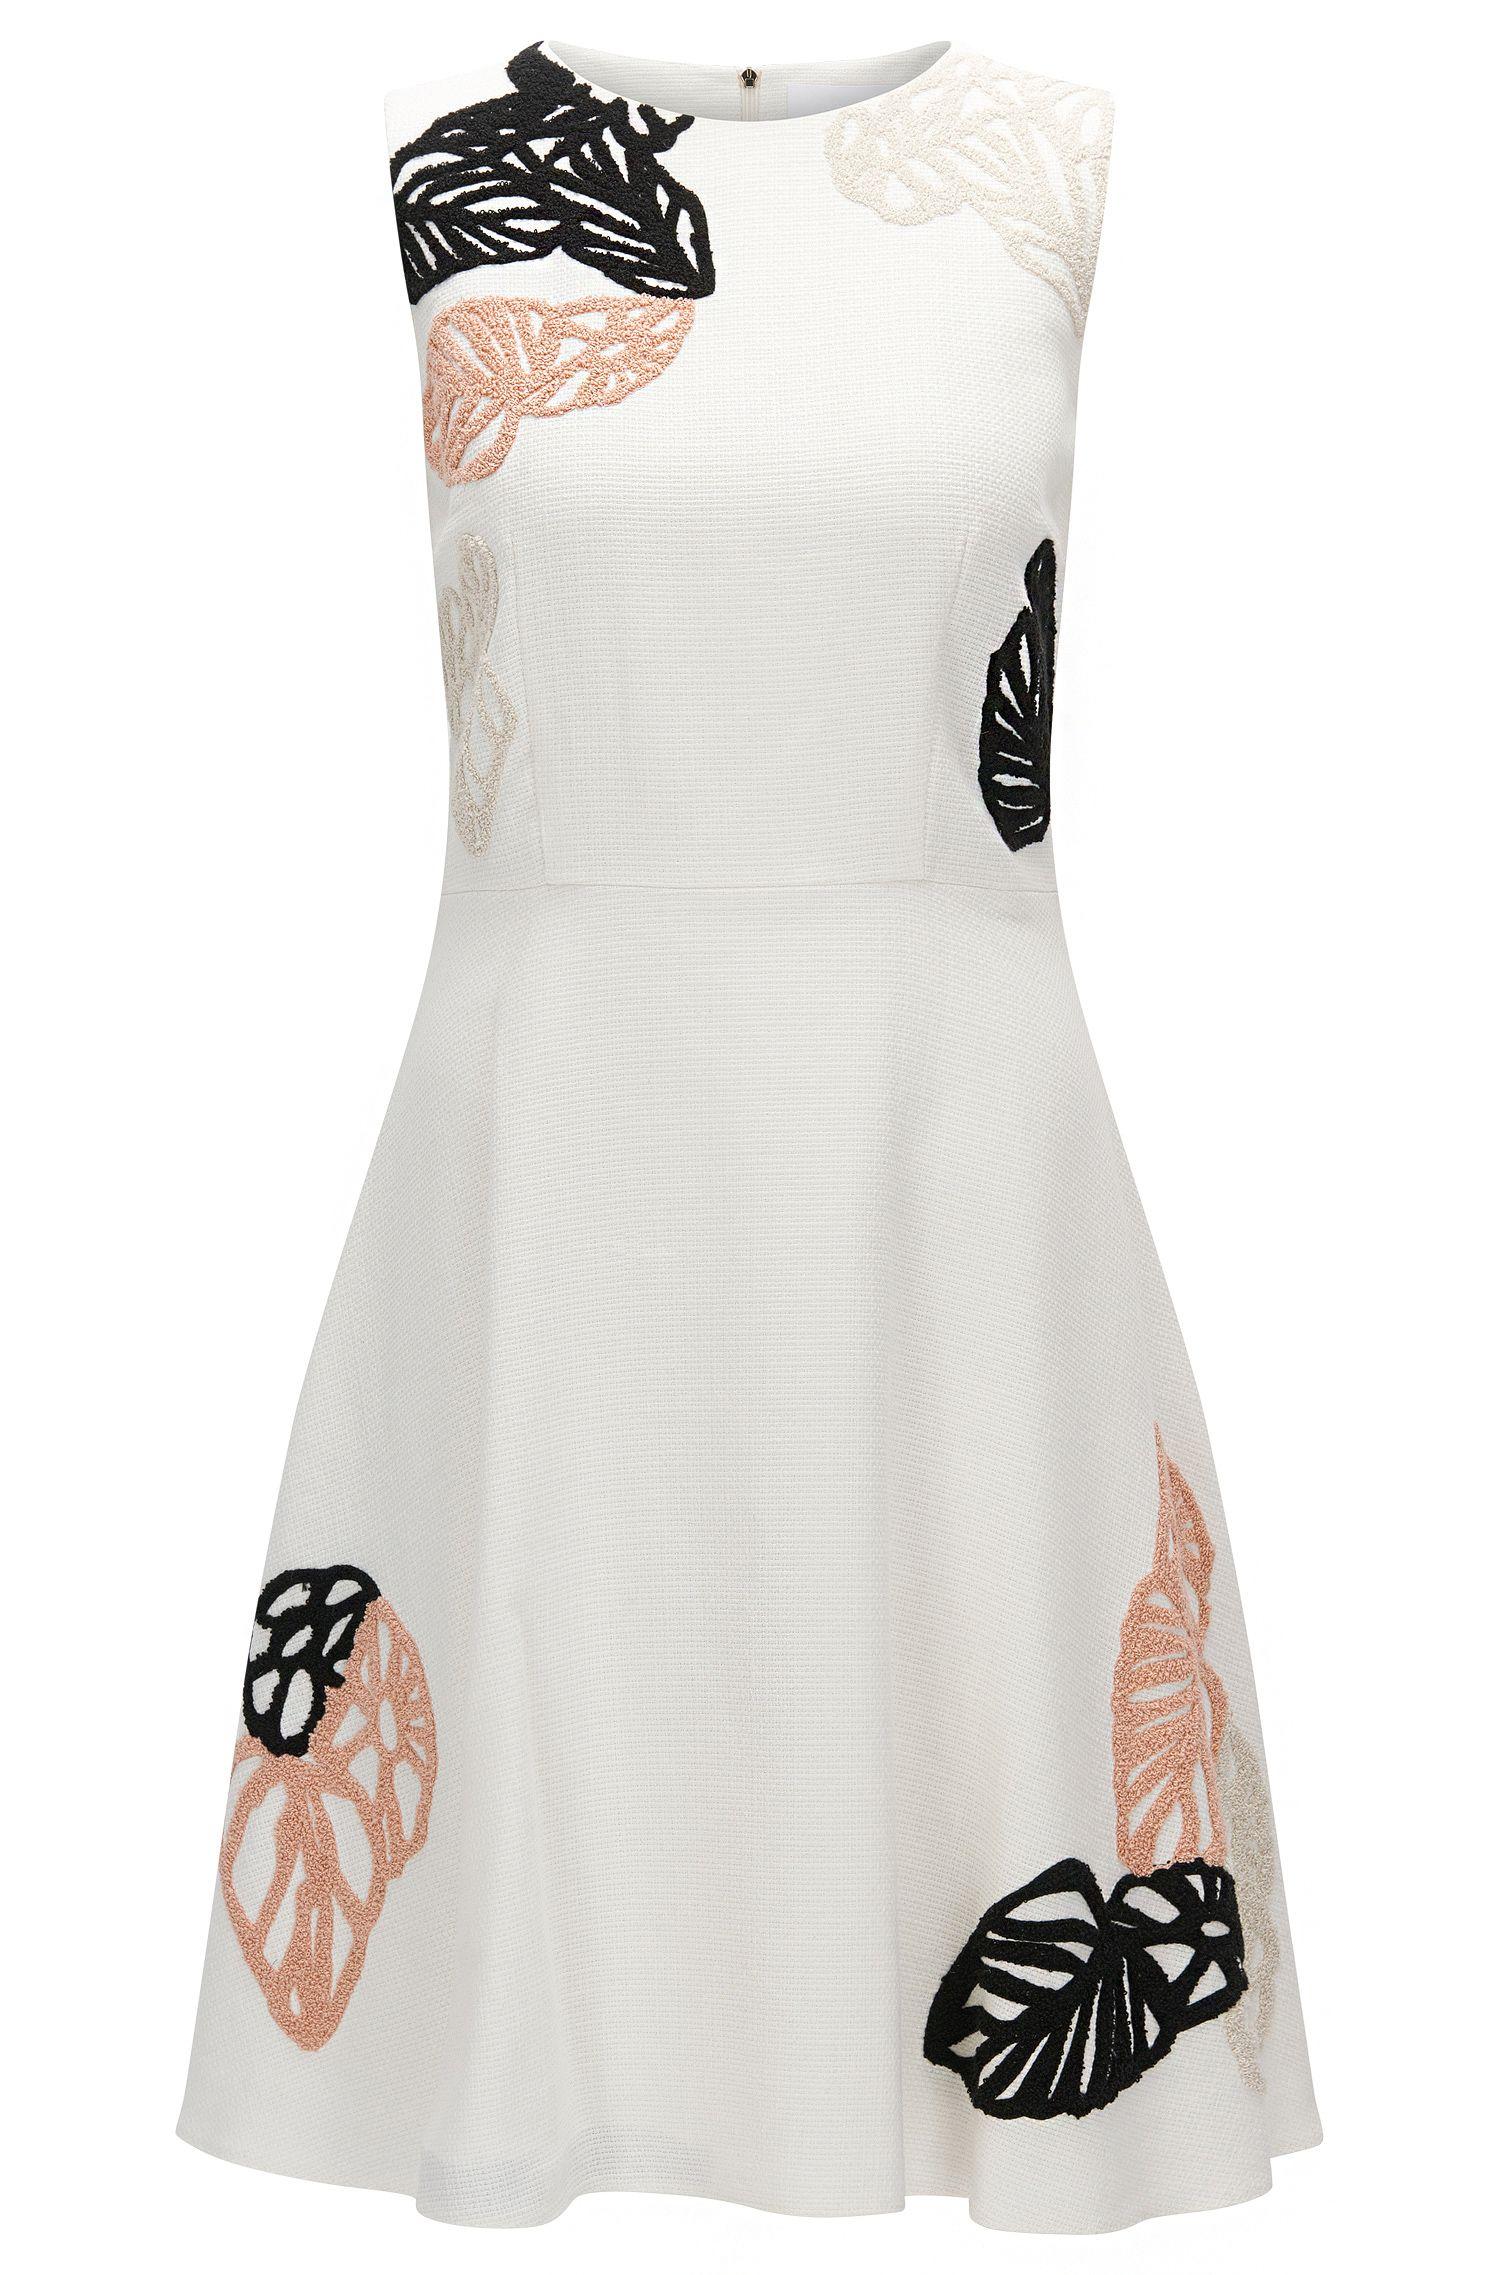 Cotton Blend Embroidered Dress | Dyfera